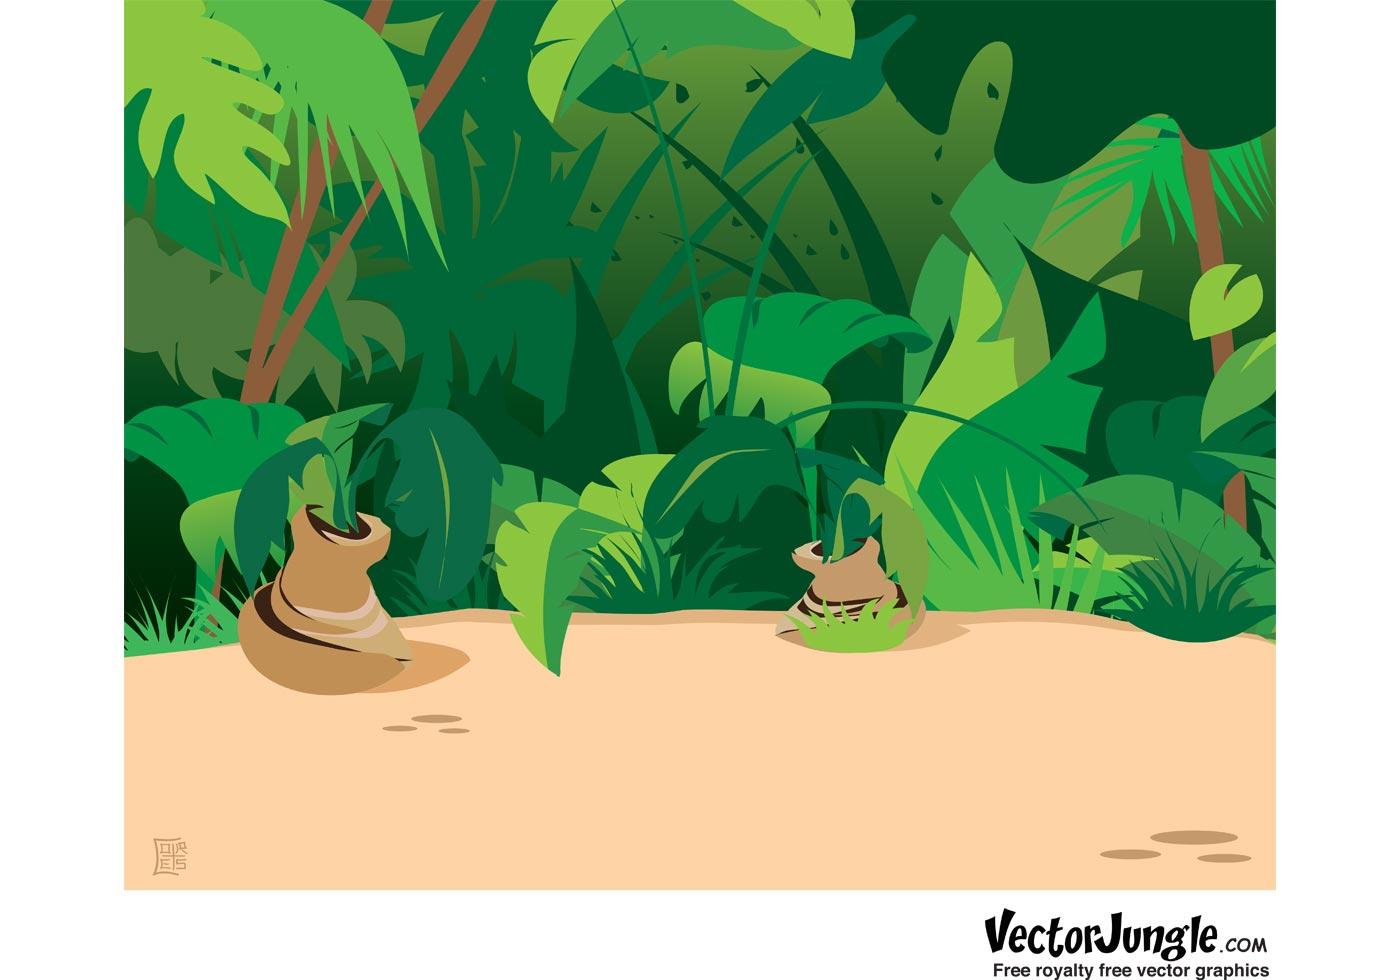 Animated Jungle Wallpaper Jungle Animals Free Vector Art 7590 Free Downloads